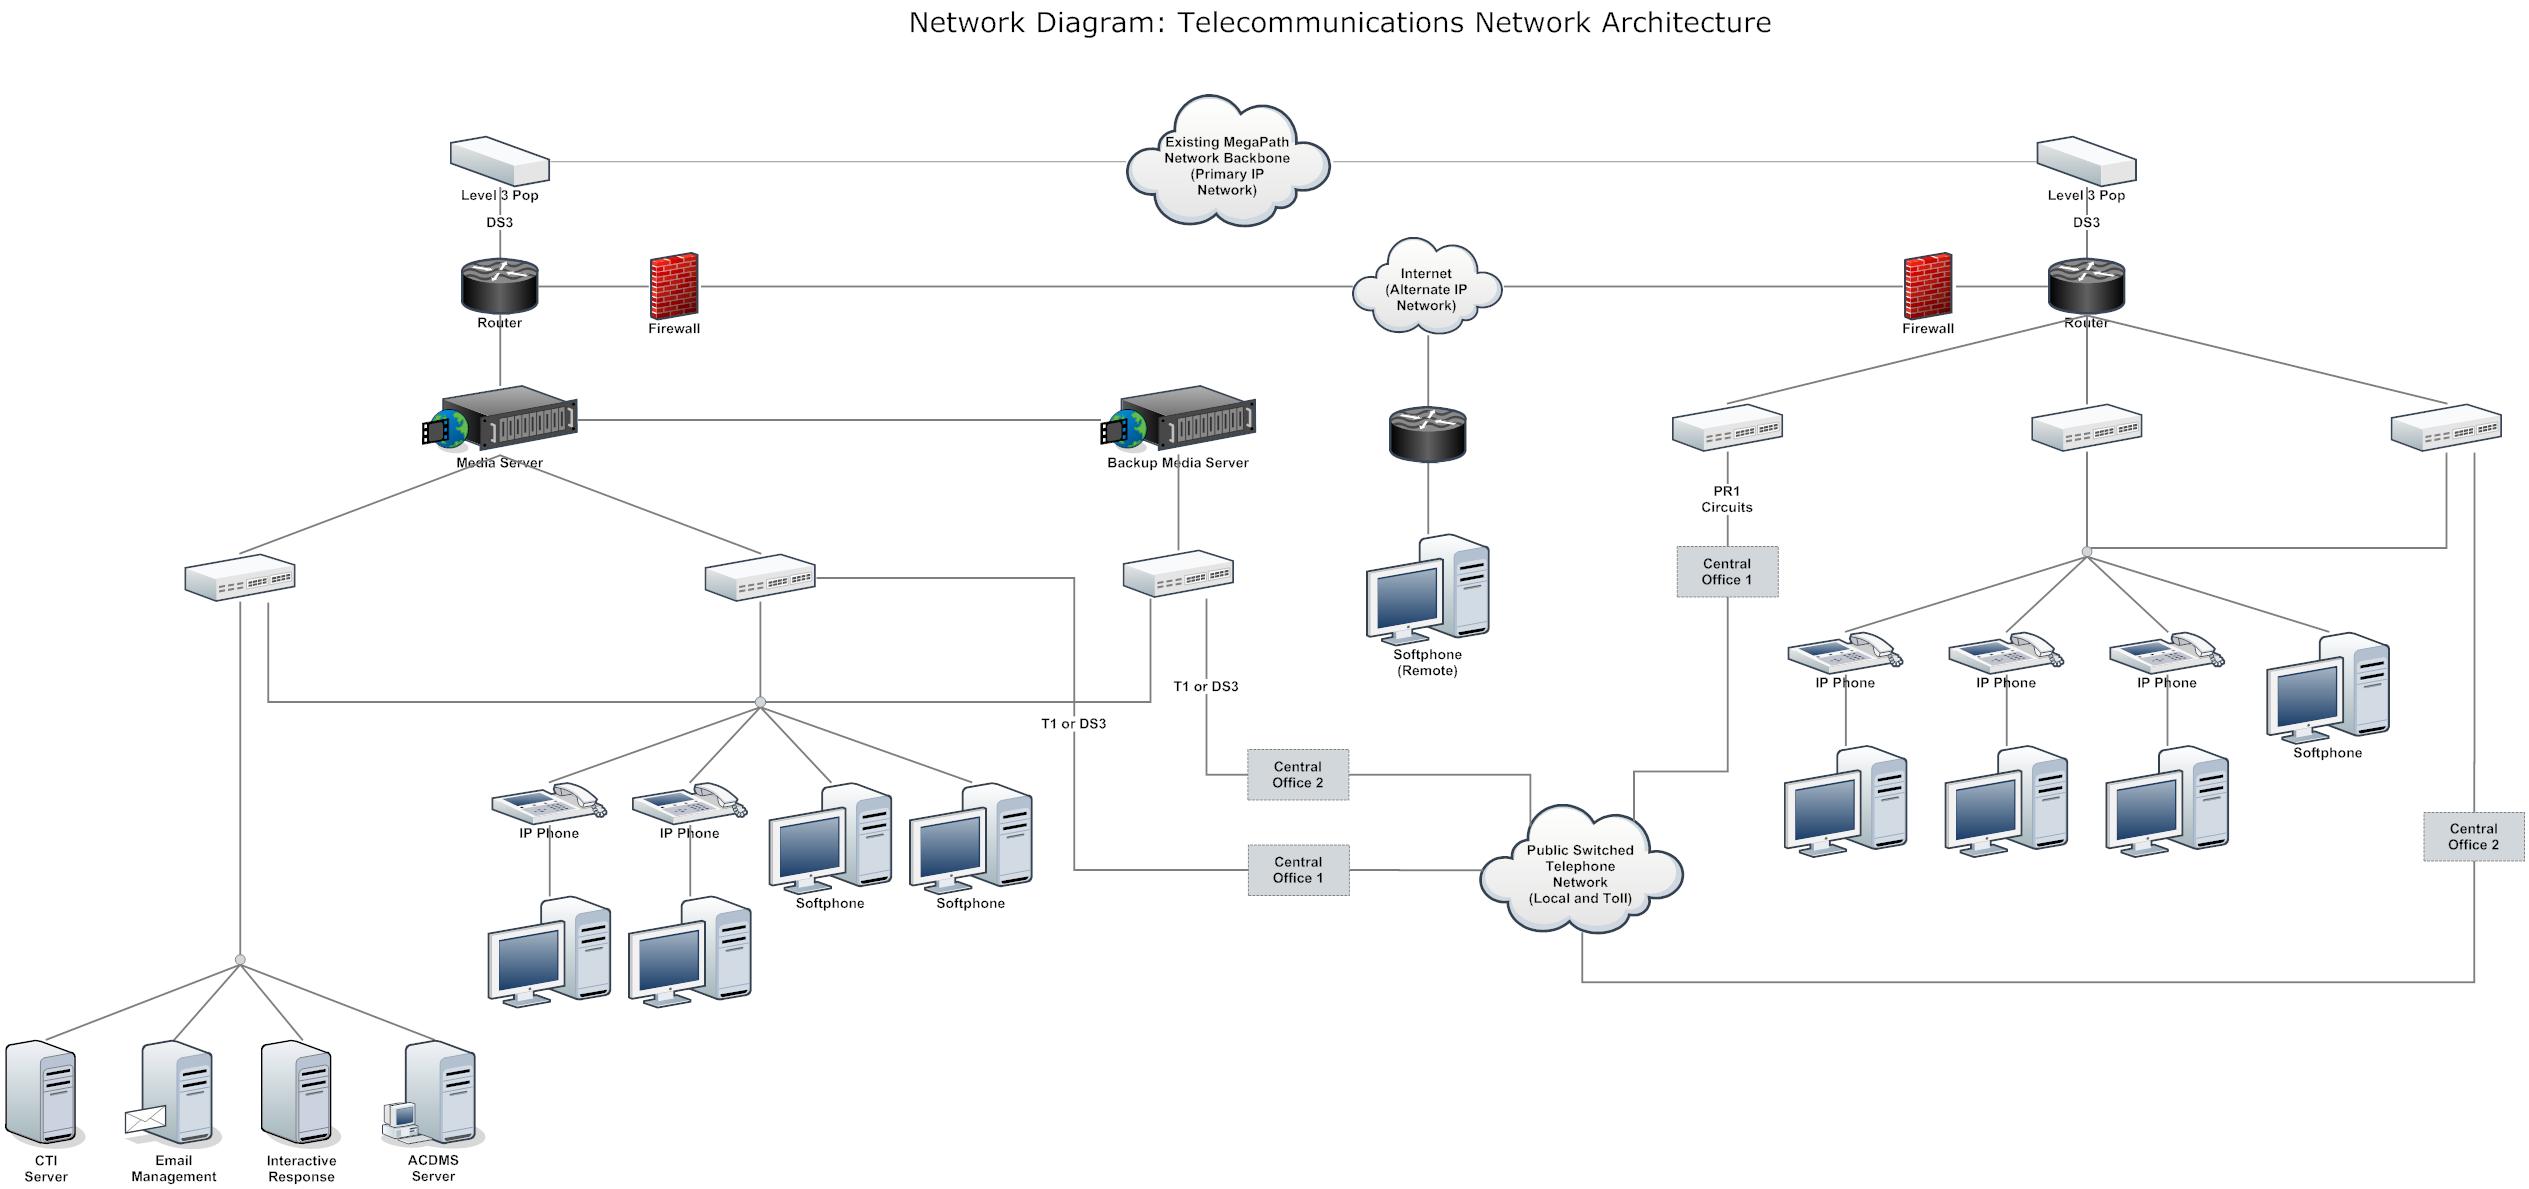 network diagram example telecommunnications network architecture network diagram example large multiprotocol network [ 2529 x 1189 Pixel ]